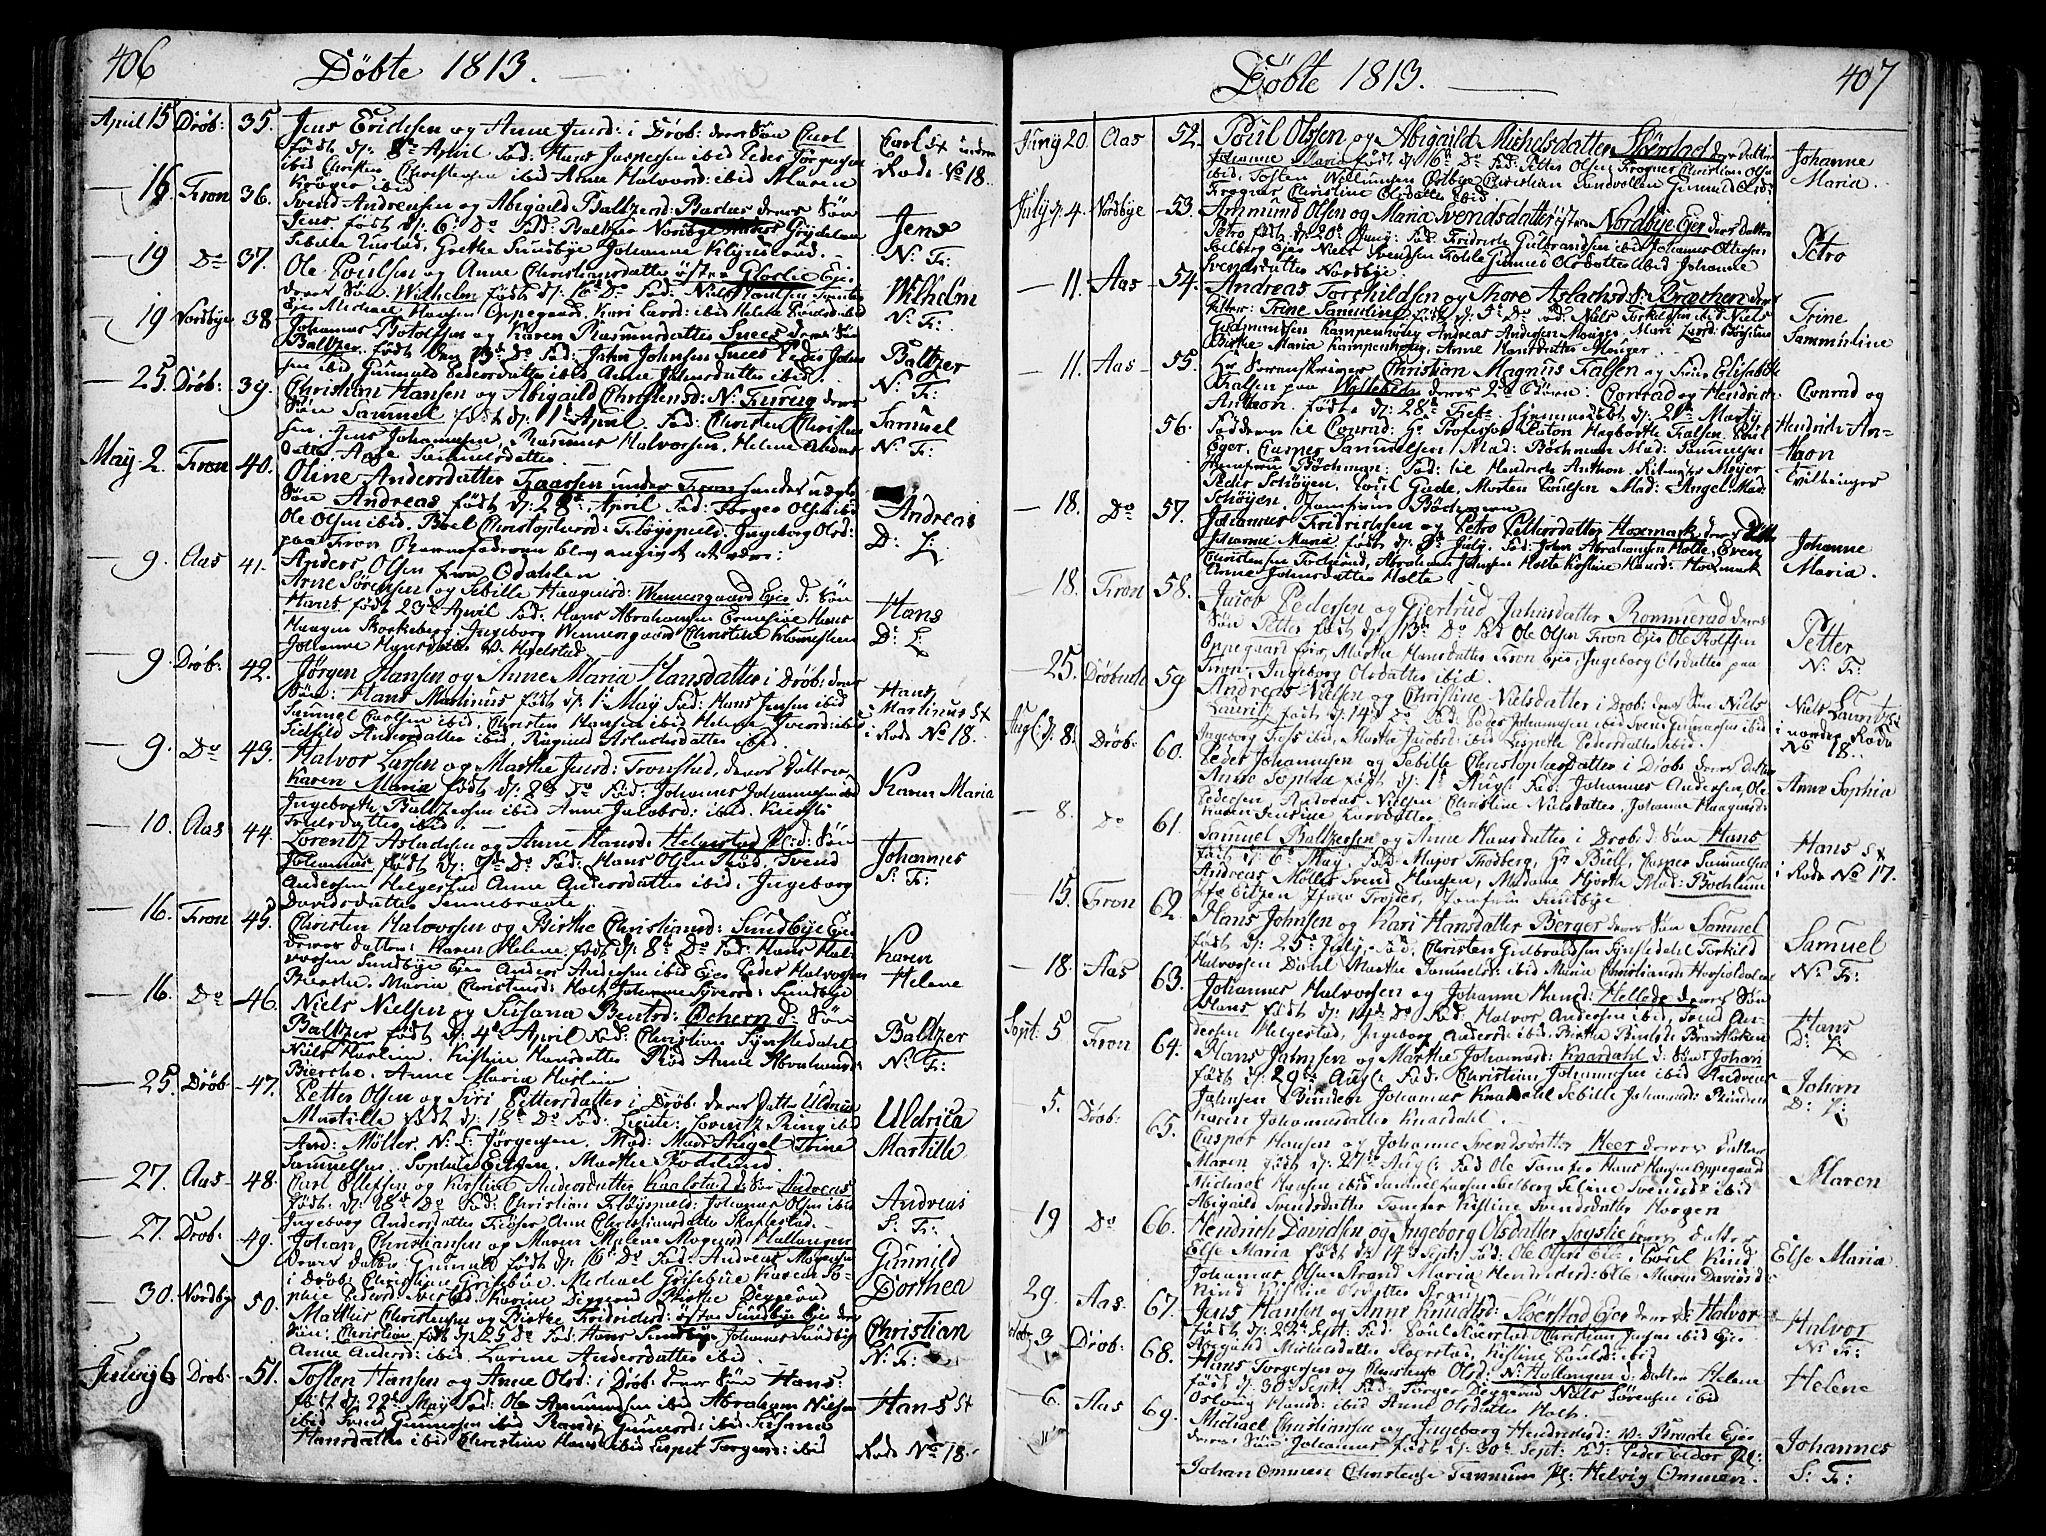 SAO, Ås prestekontor Kirkebøker, F/Fa/L0002: Ministerialbok nr. I 2, 1778-1813, s. 406-407